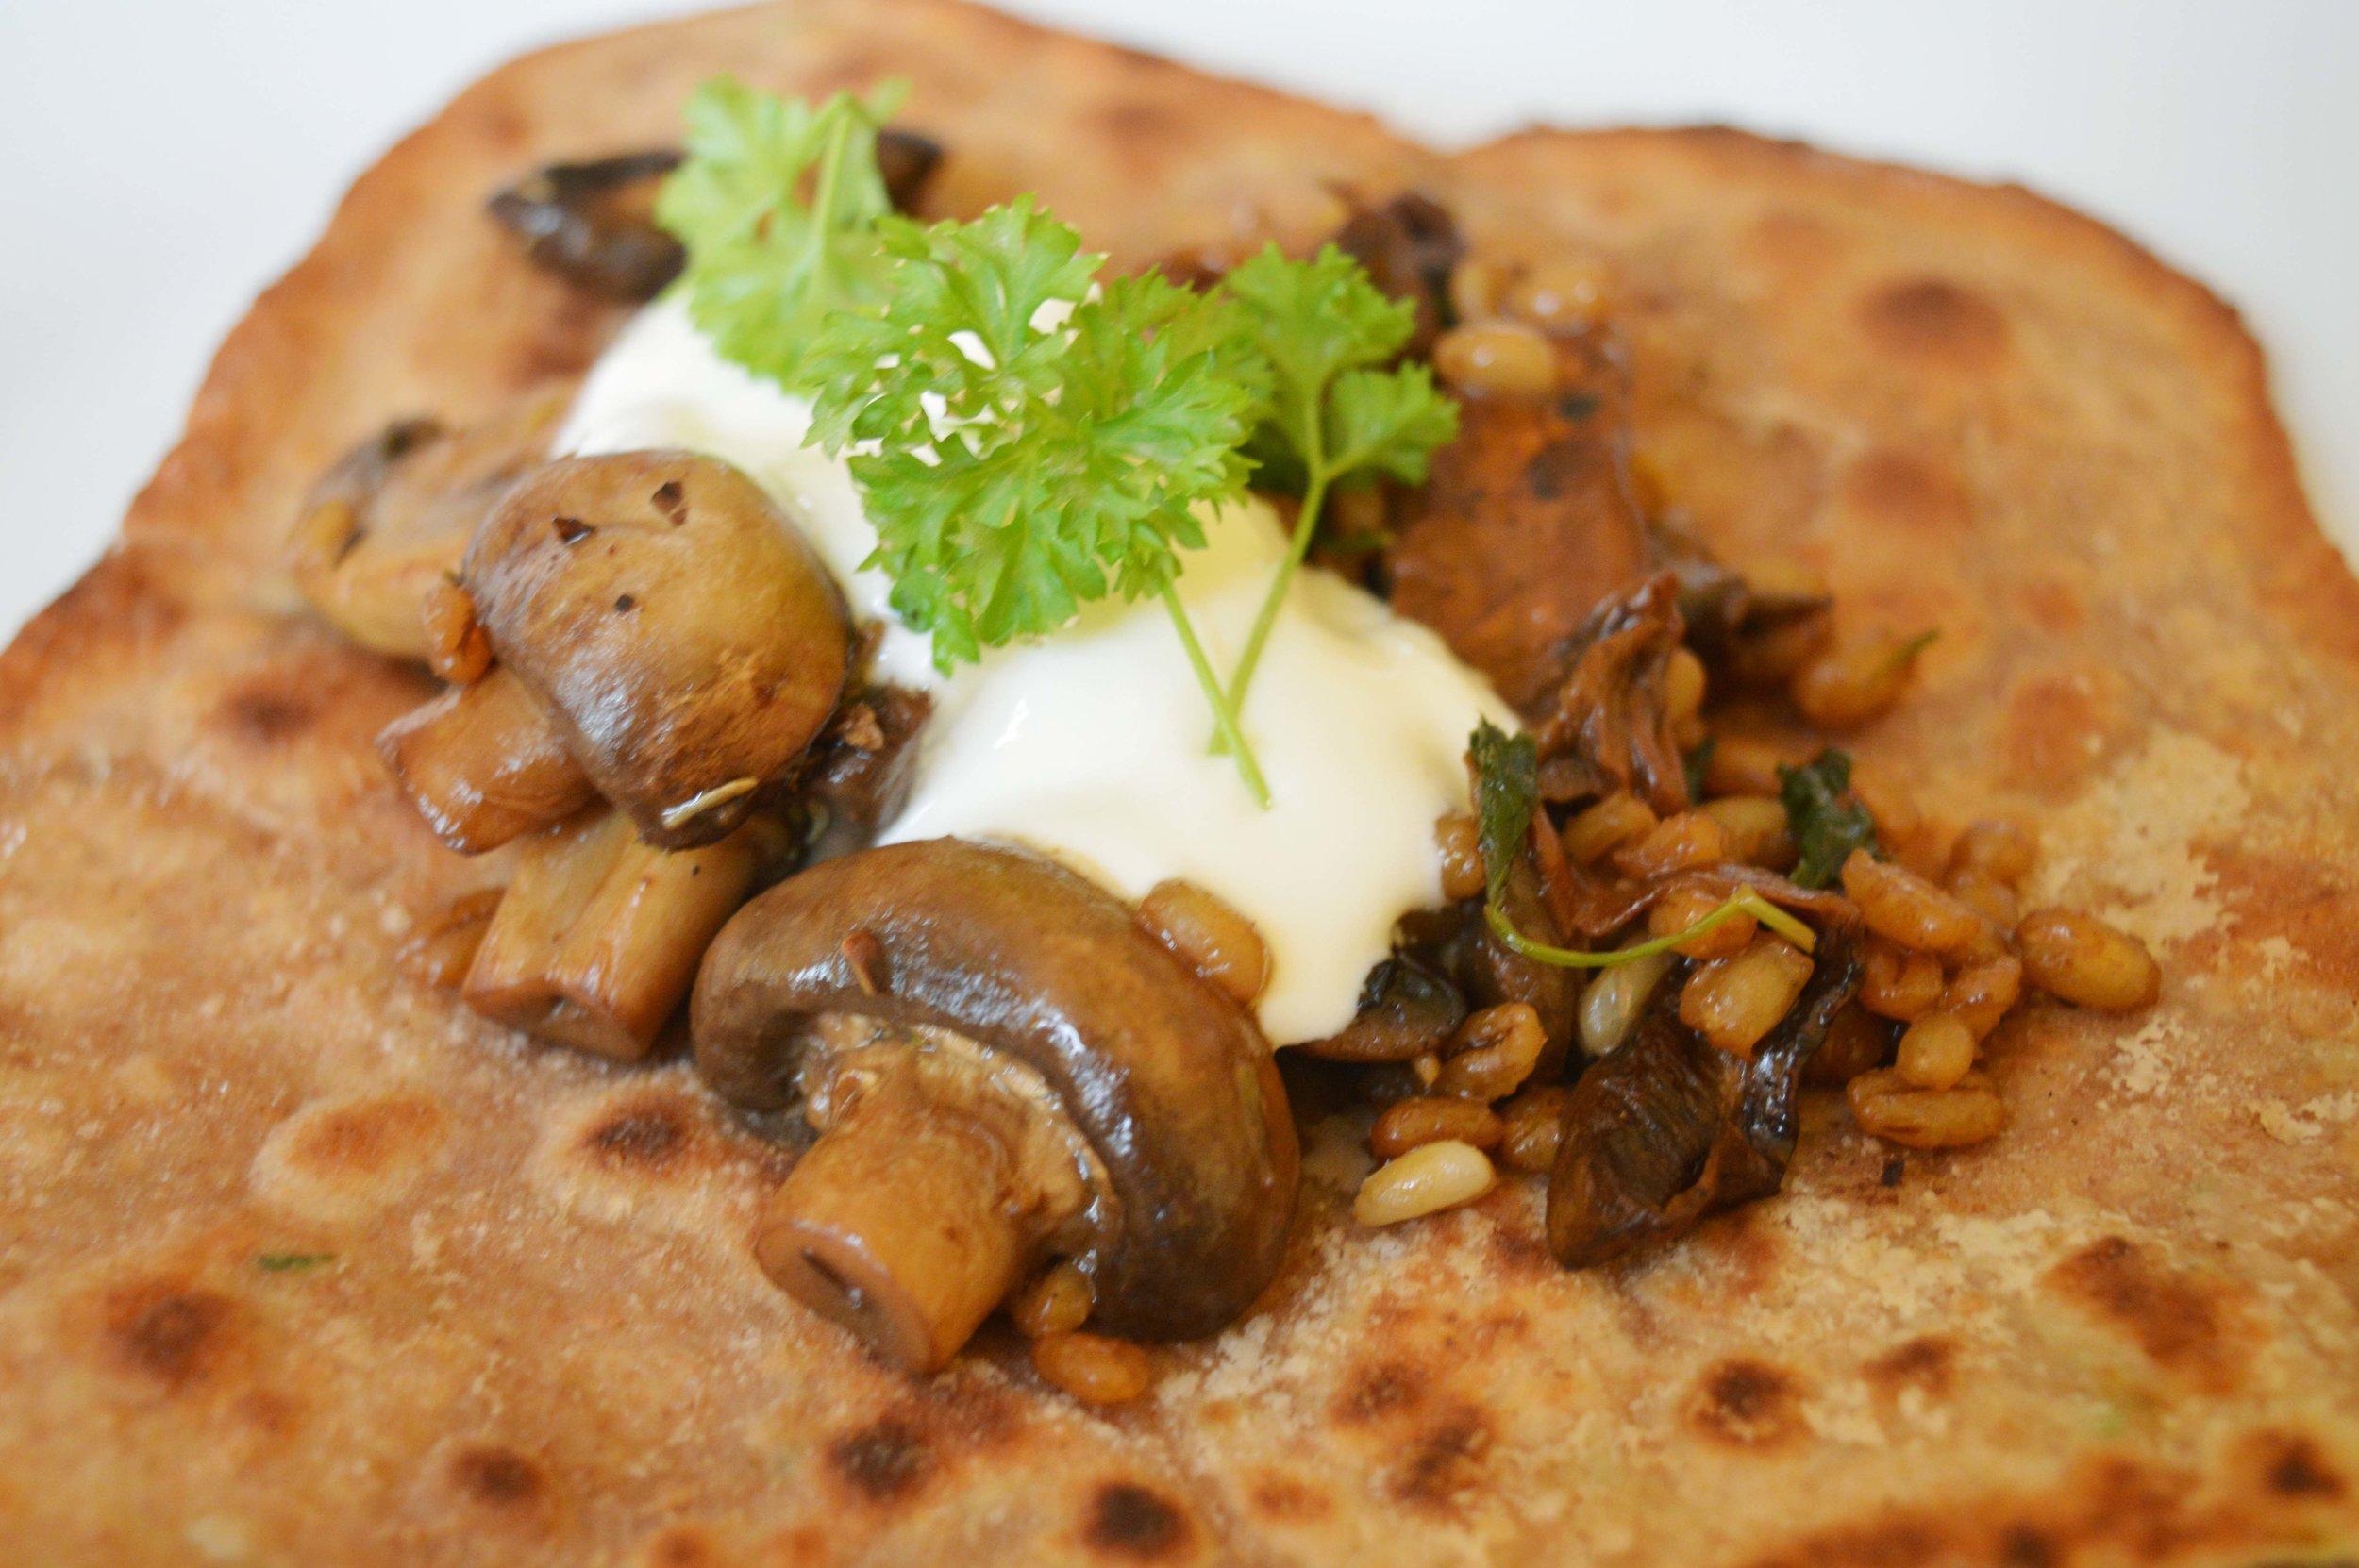 Yoghurt flatbreads with barley and mushrooms